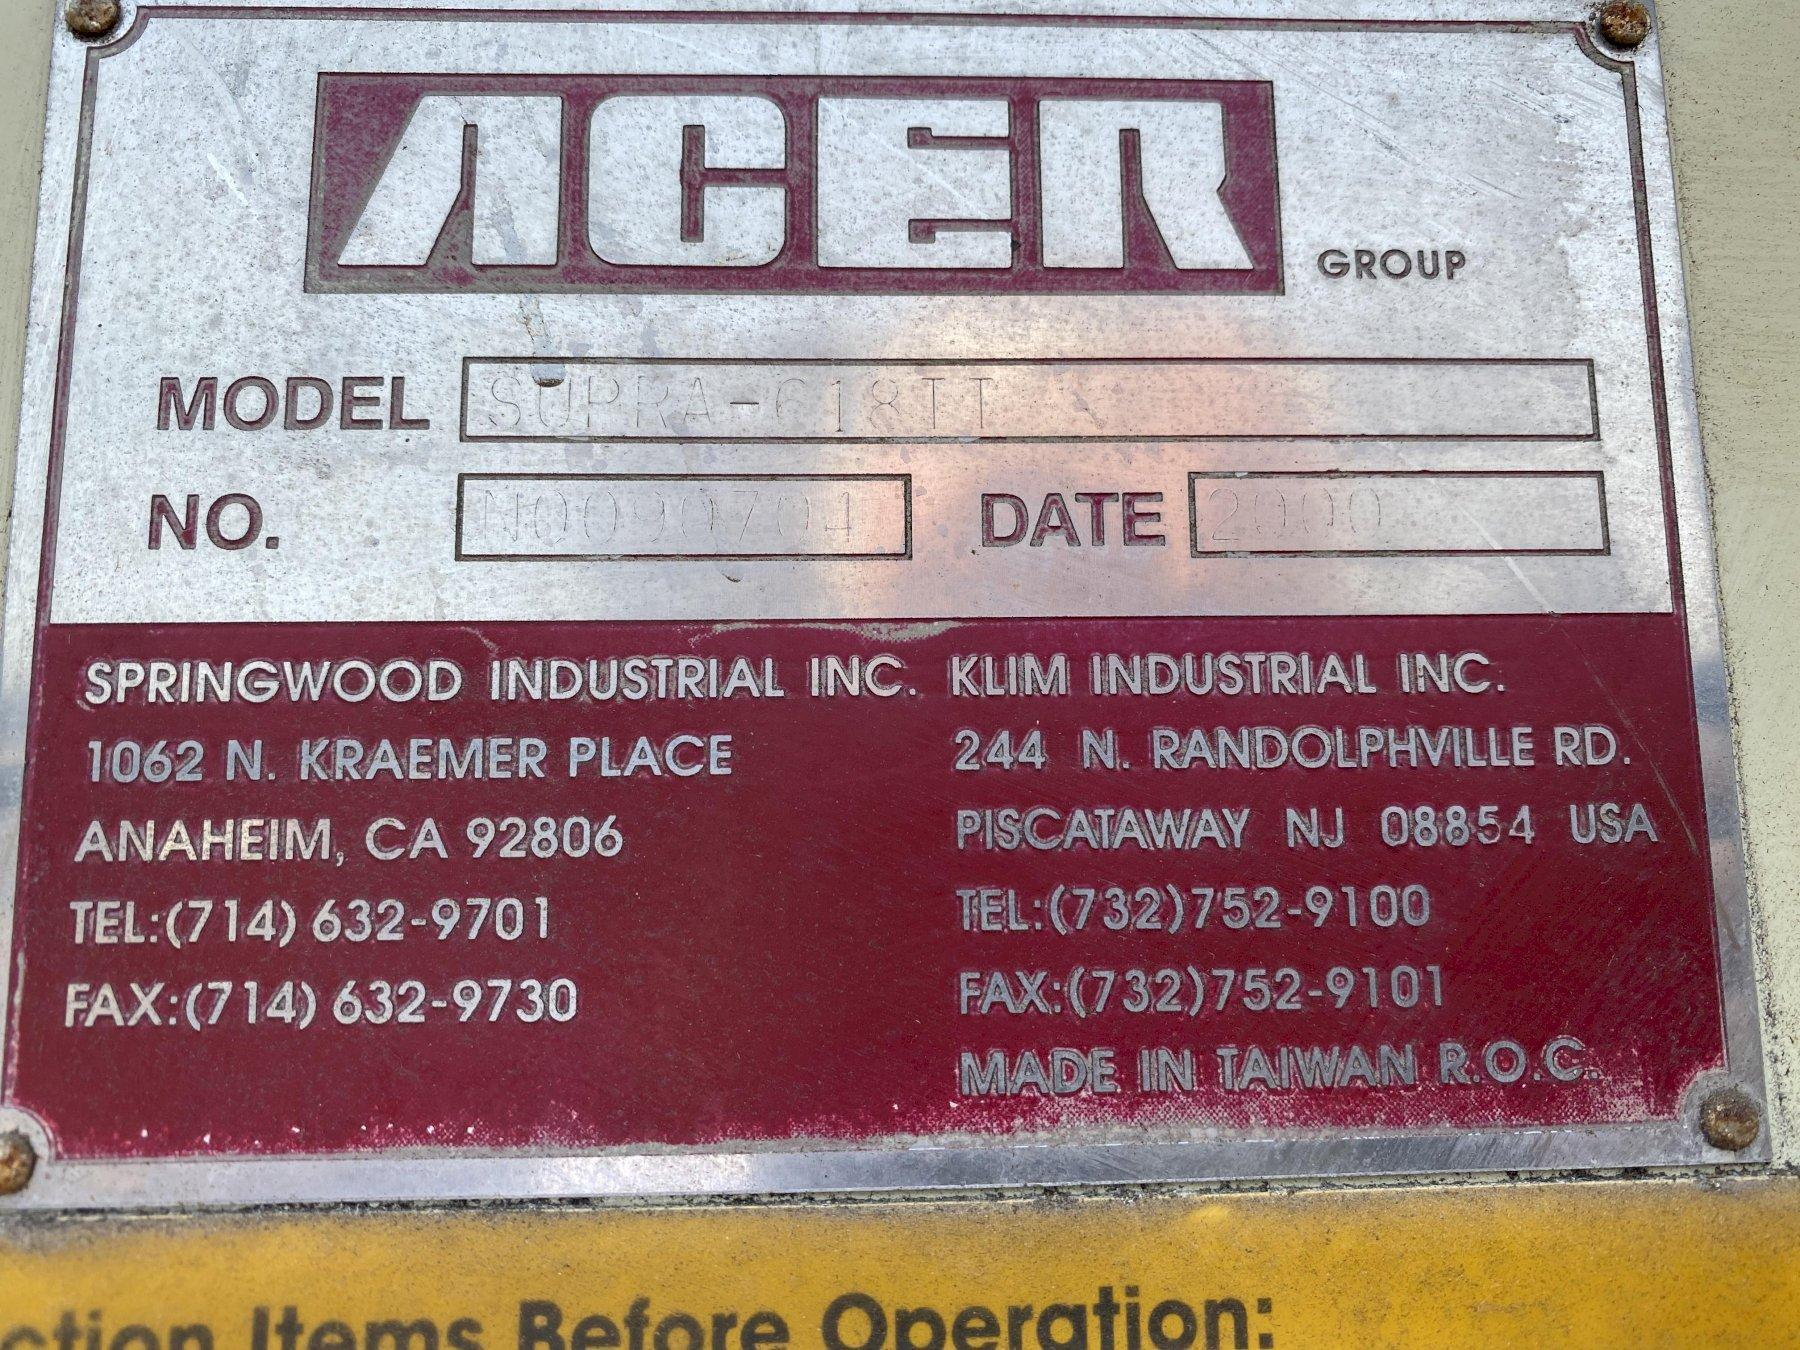 "6"" X 18"" ACER MODEL SUPRA-618II HYDRAULIC HORIZONTAL SURFACE GRINDER: STOCK #14510"